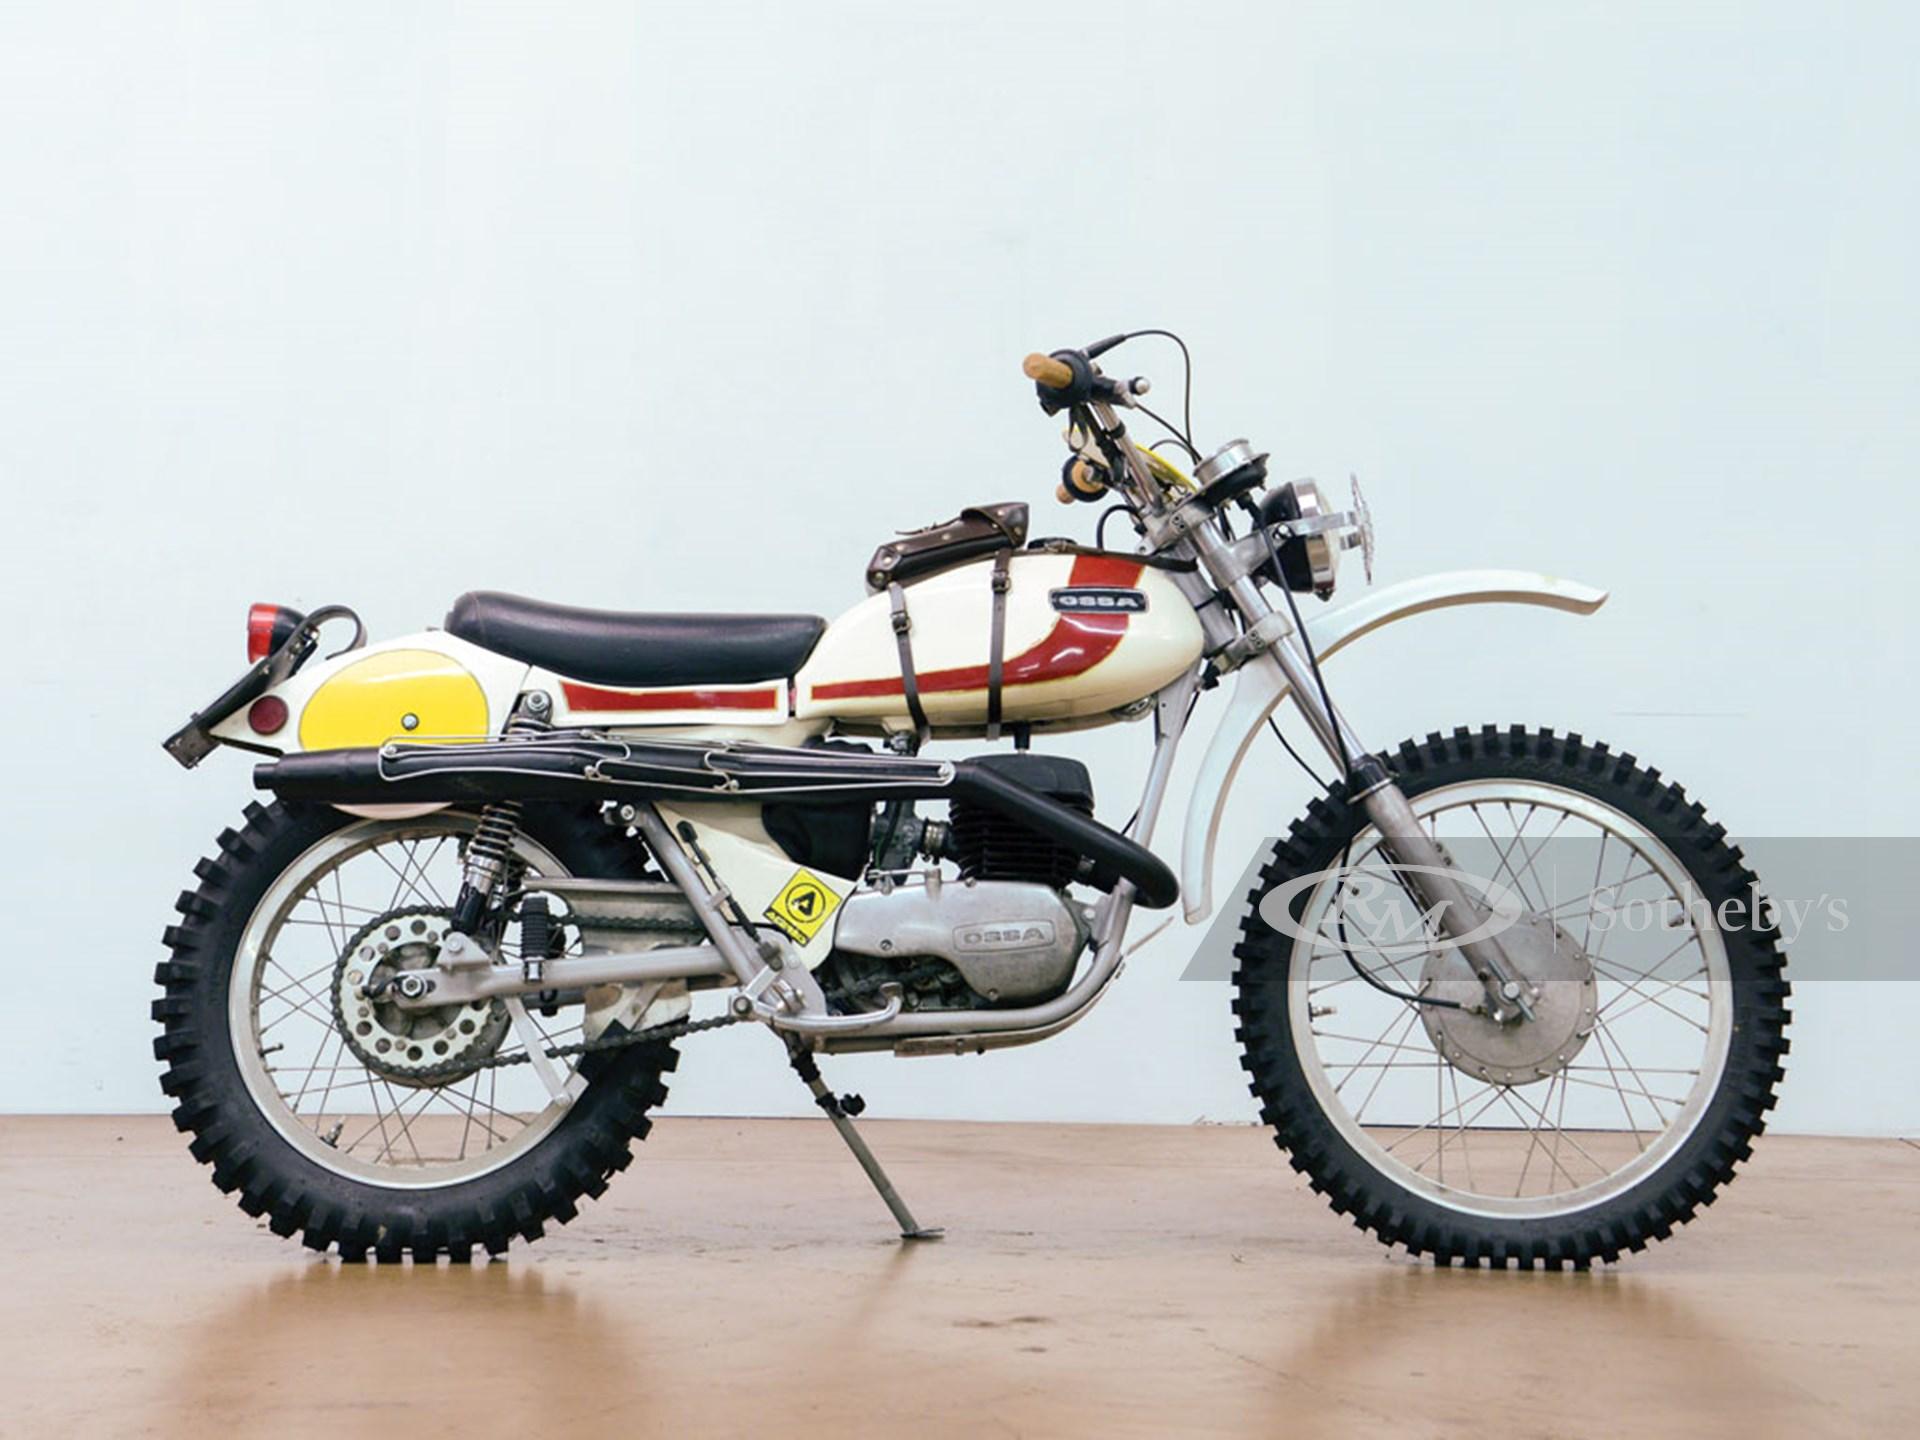 1975 OSSA 250 Enduro